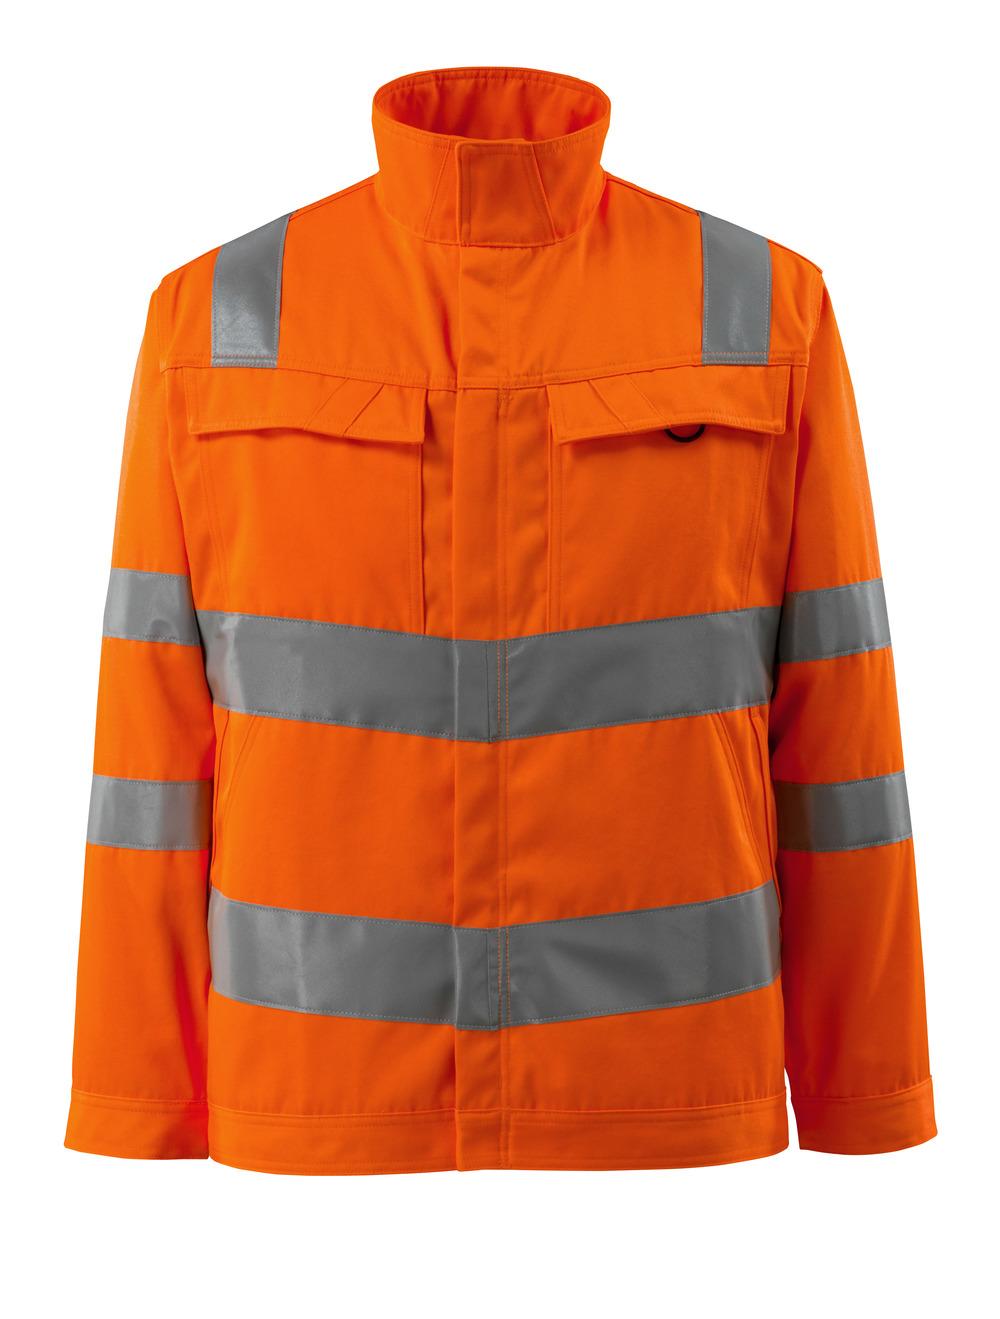 16909-860-14 Veste - Hi-vis orange